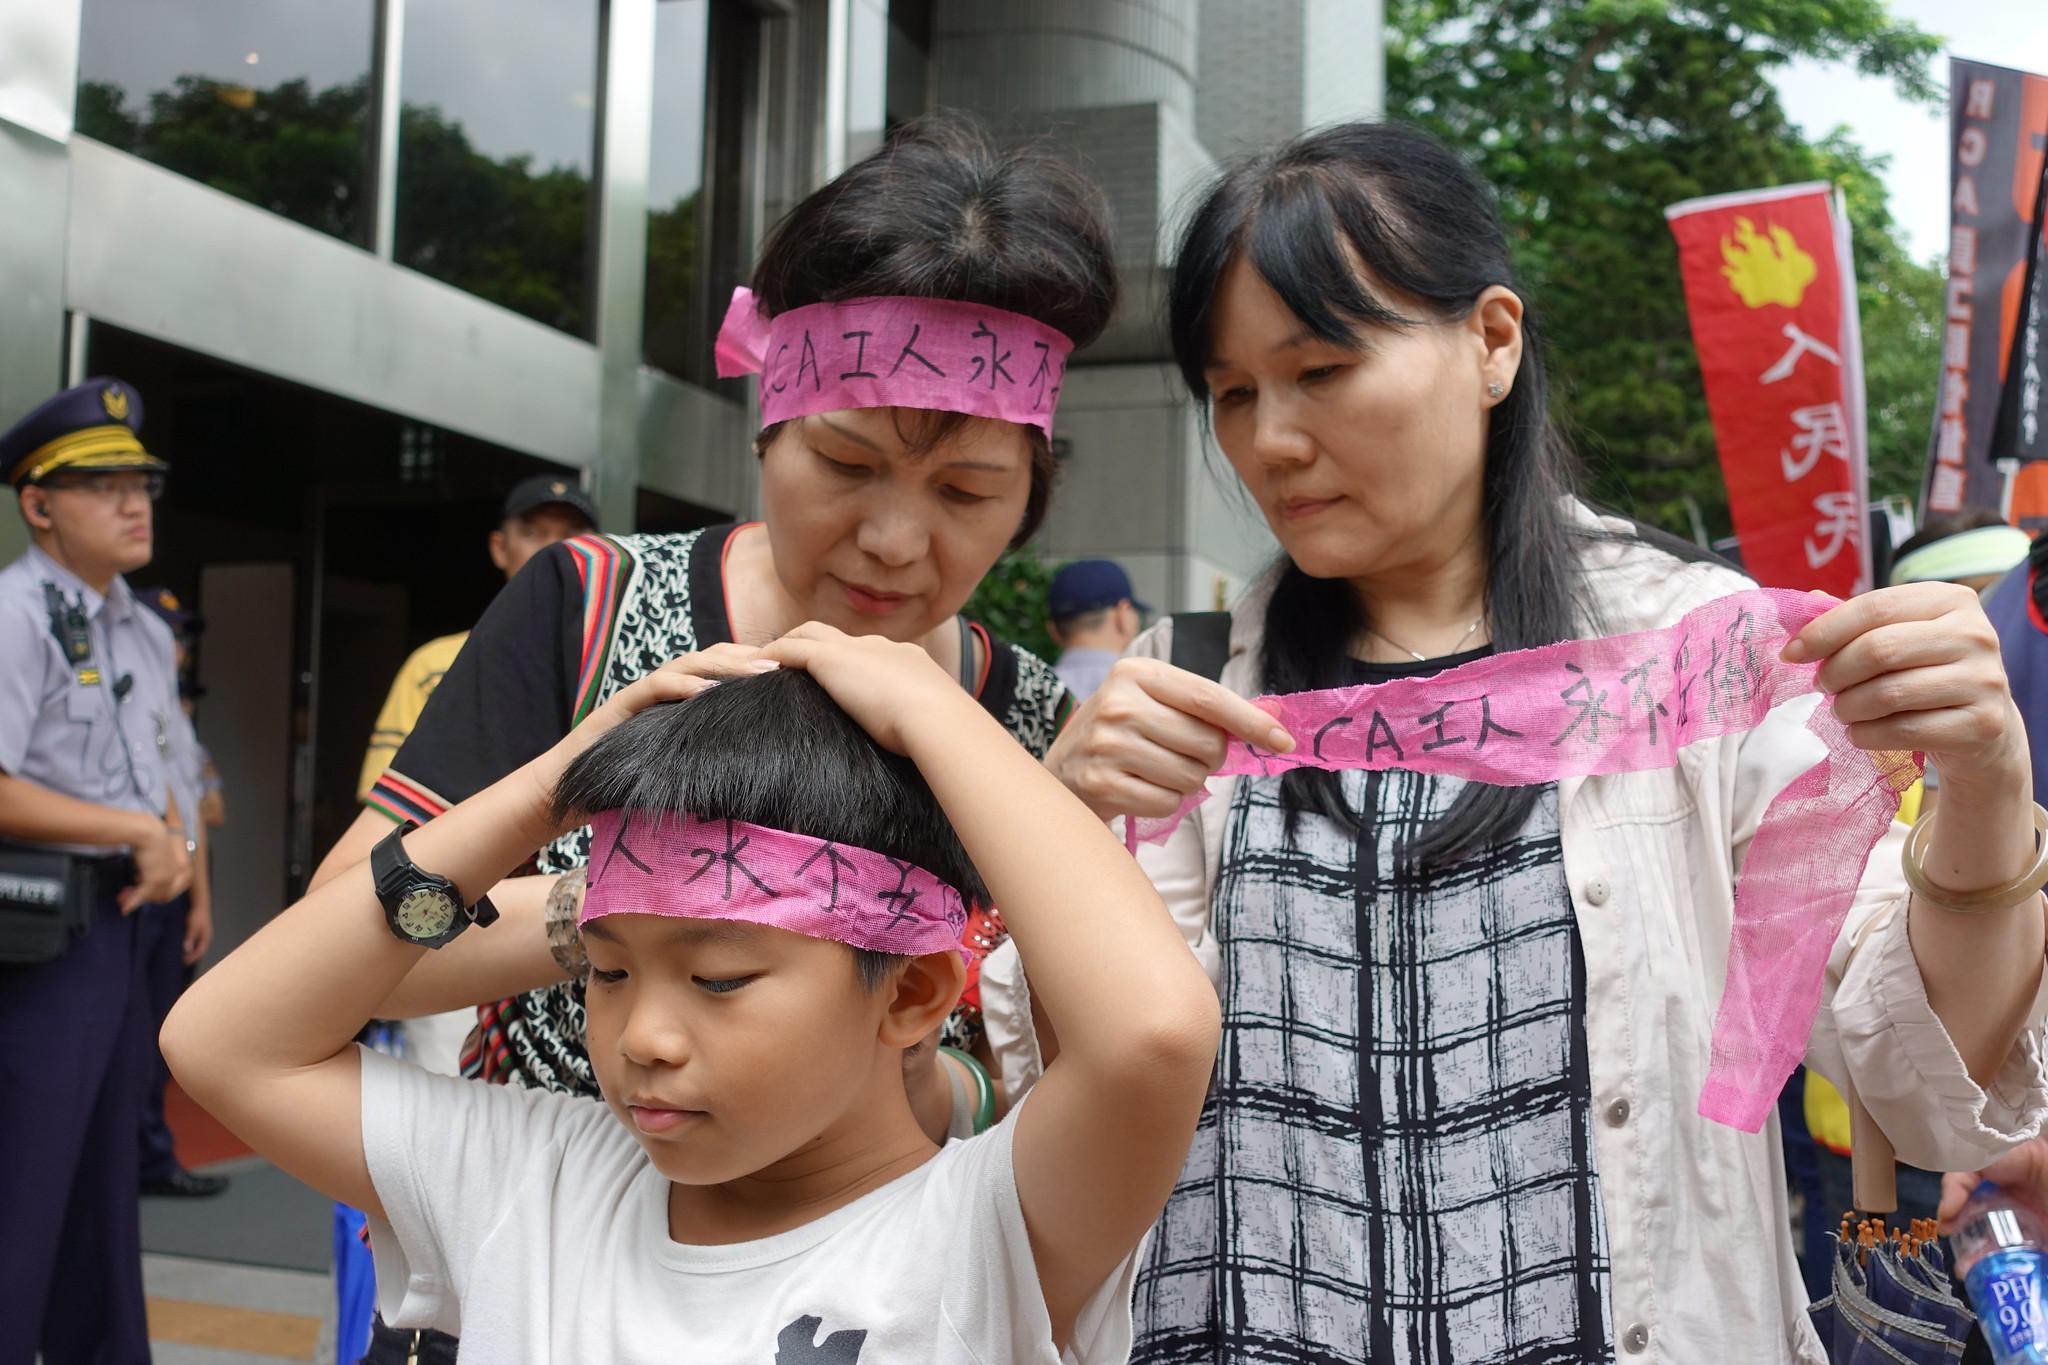 RCA員工為孩子別上「RCA工人永不妥協」的頭巾。(攝影:張智琦)